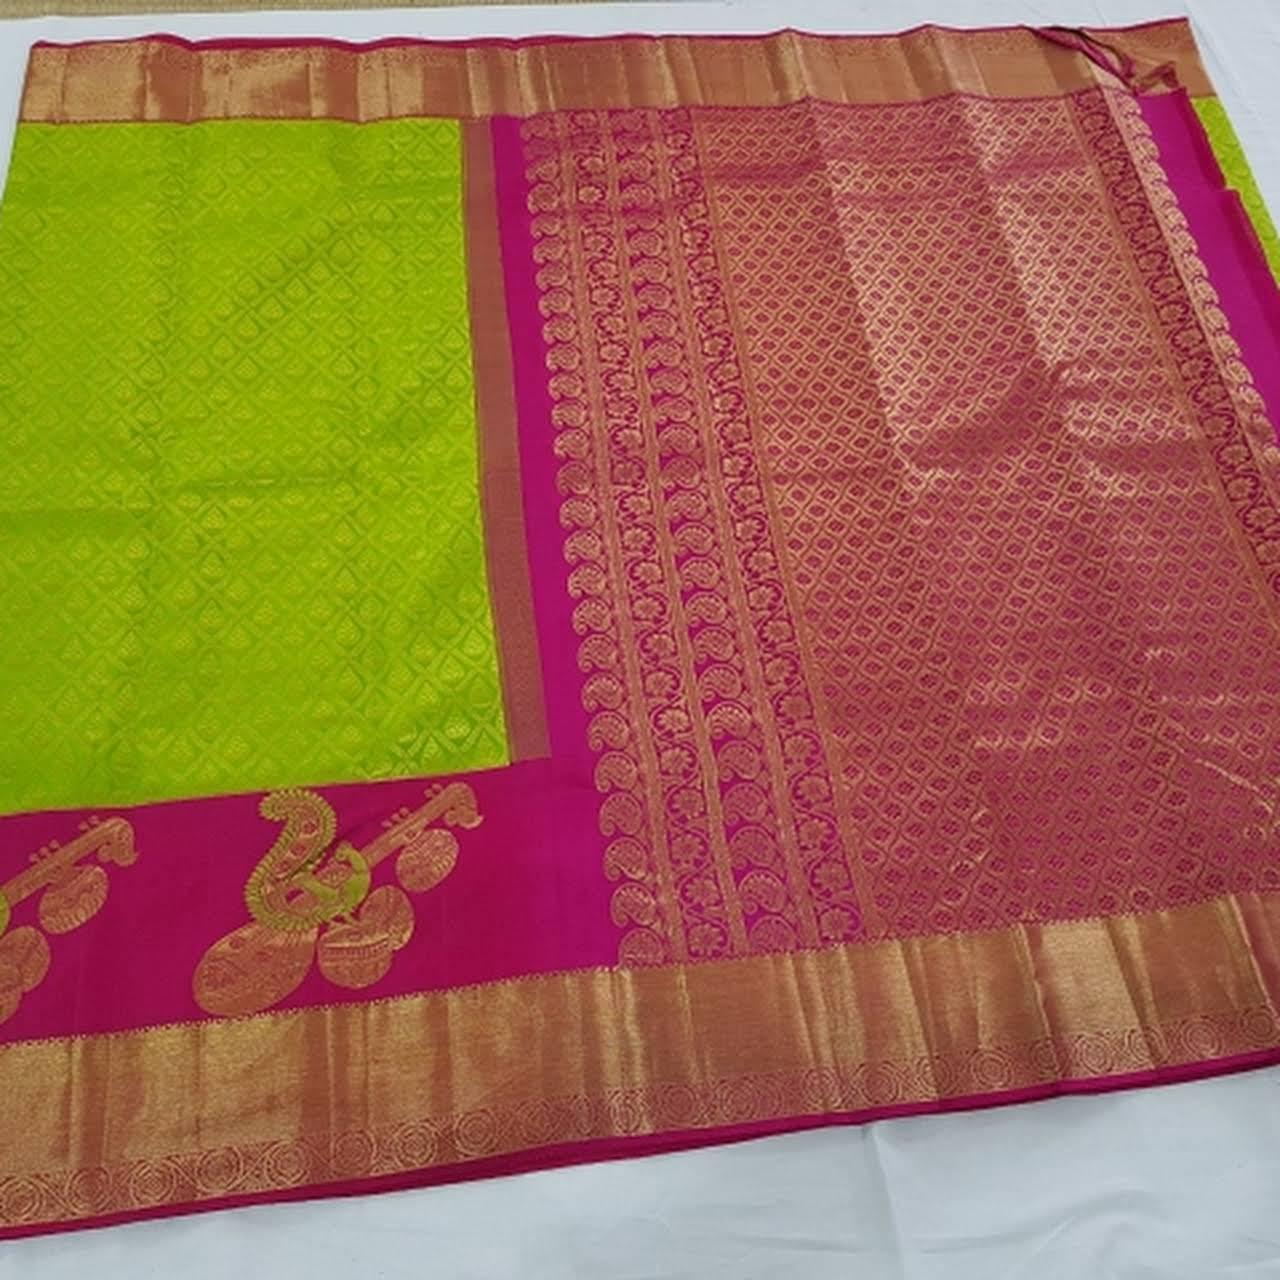 Kanchi pattu sarees - Silk Store in Orikkai, kanchipuram